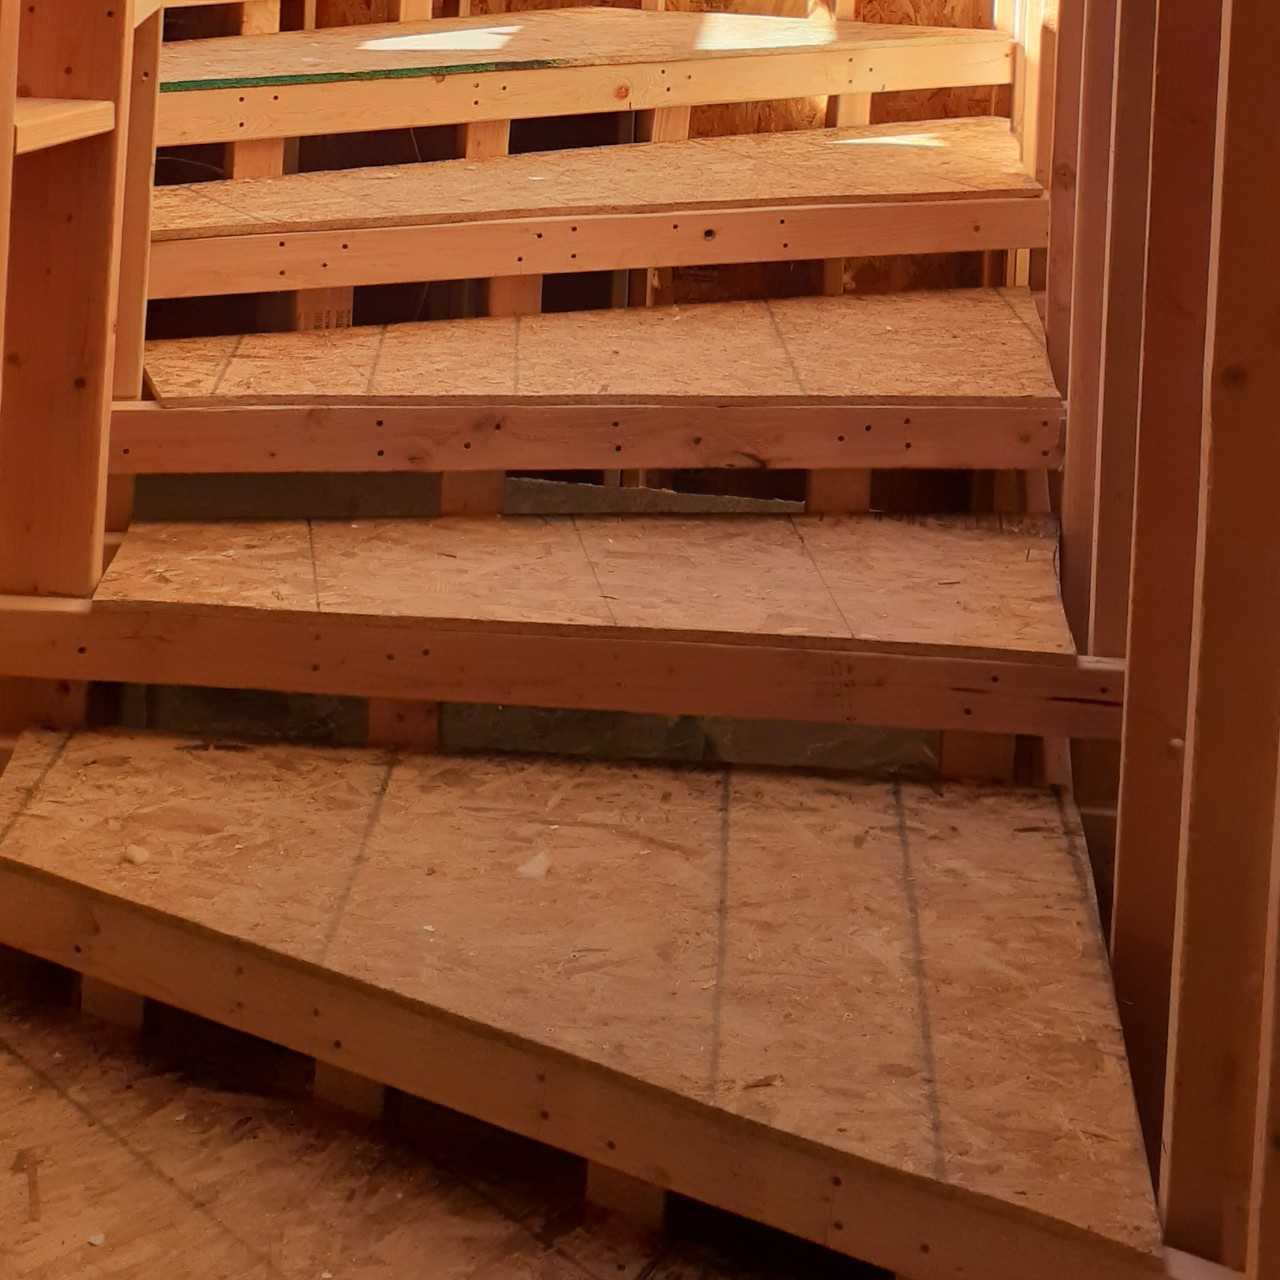 carpentry-wood-framing-second-floor-home-addition--framing-48